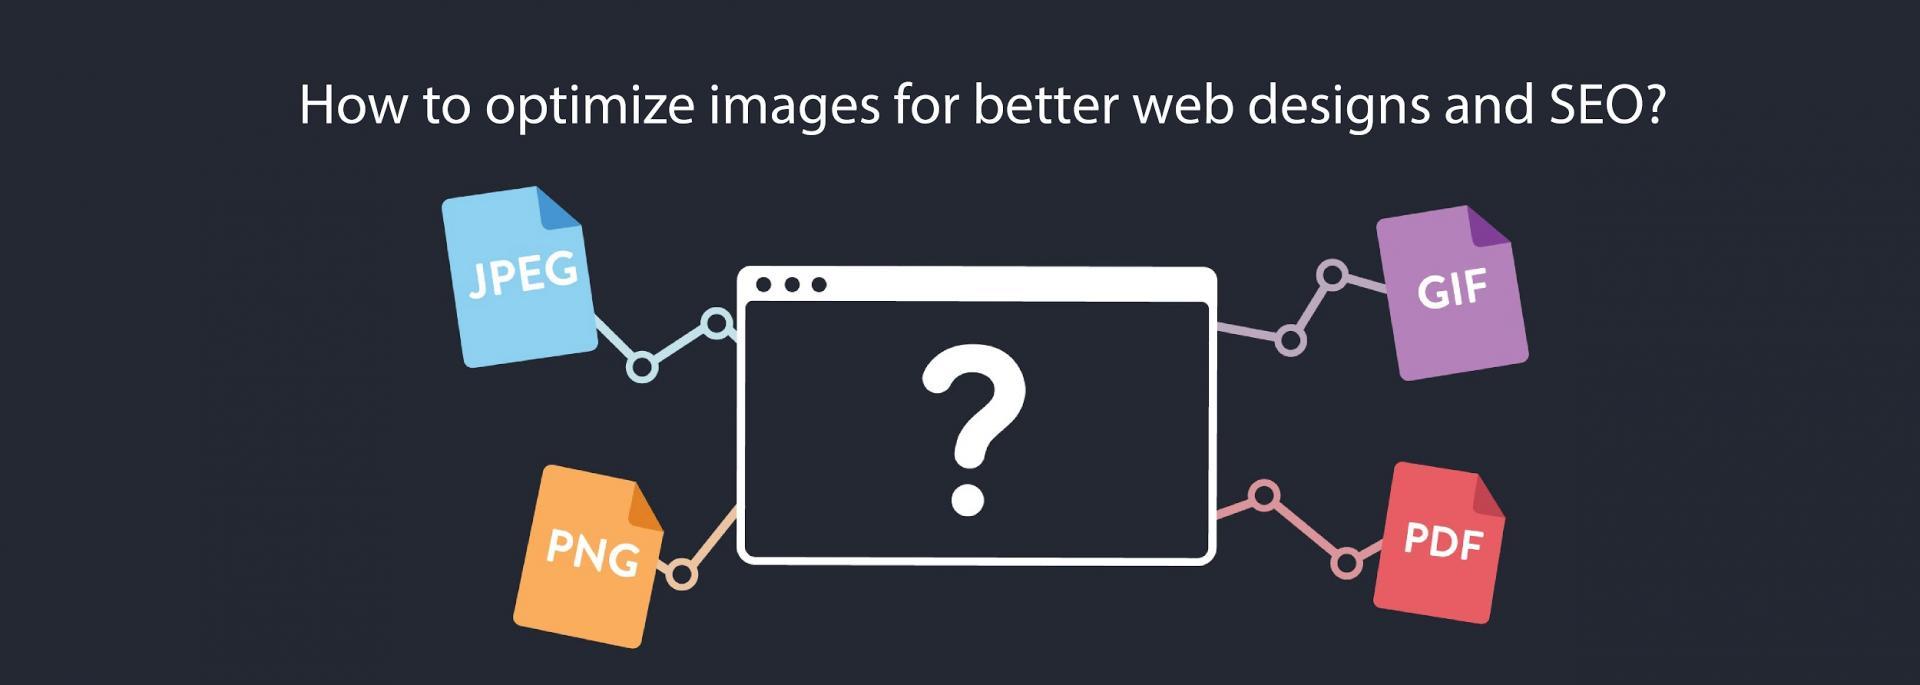 web designs and SEO